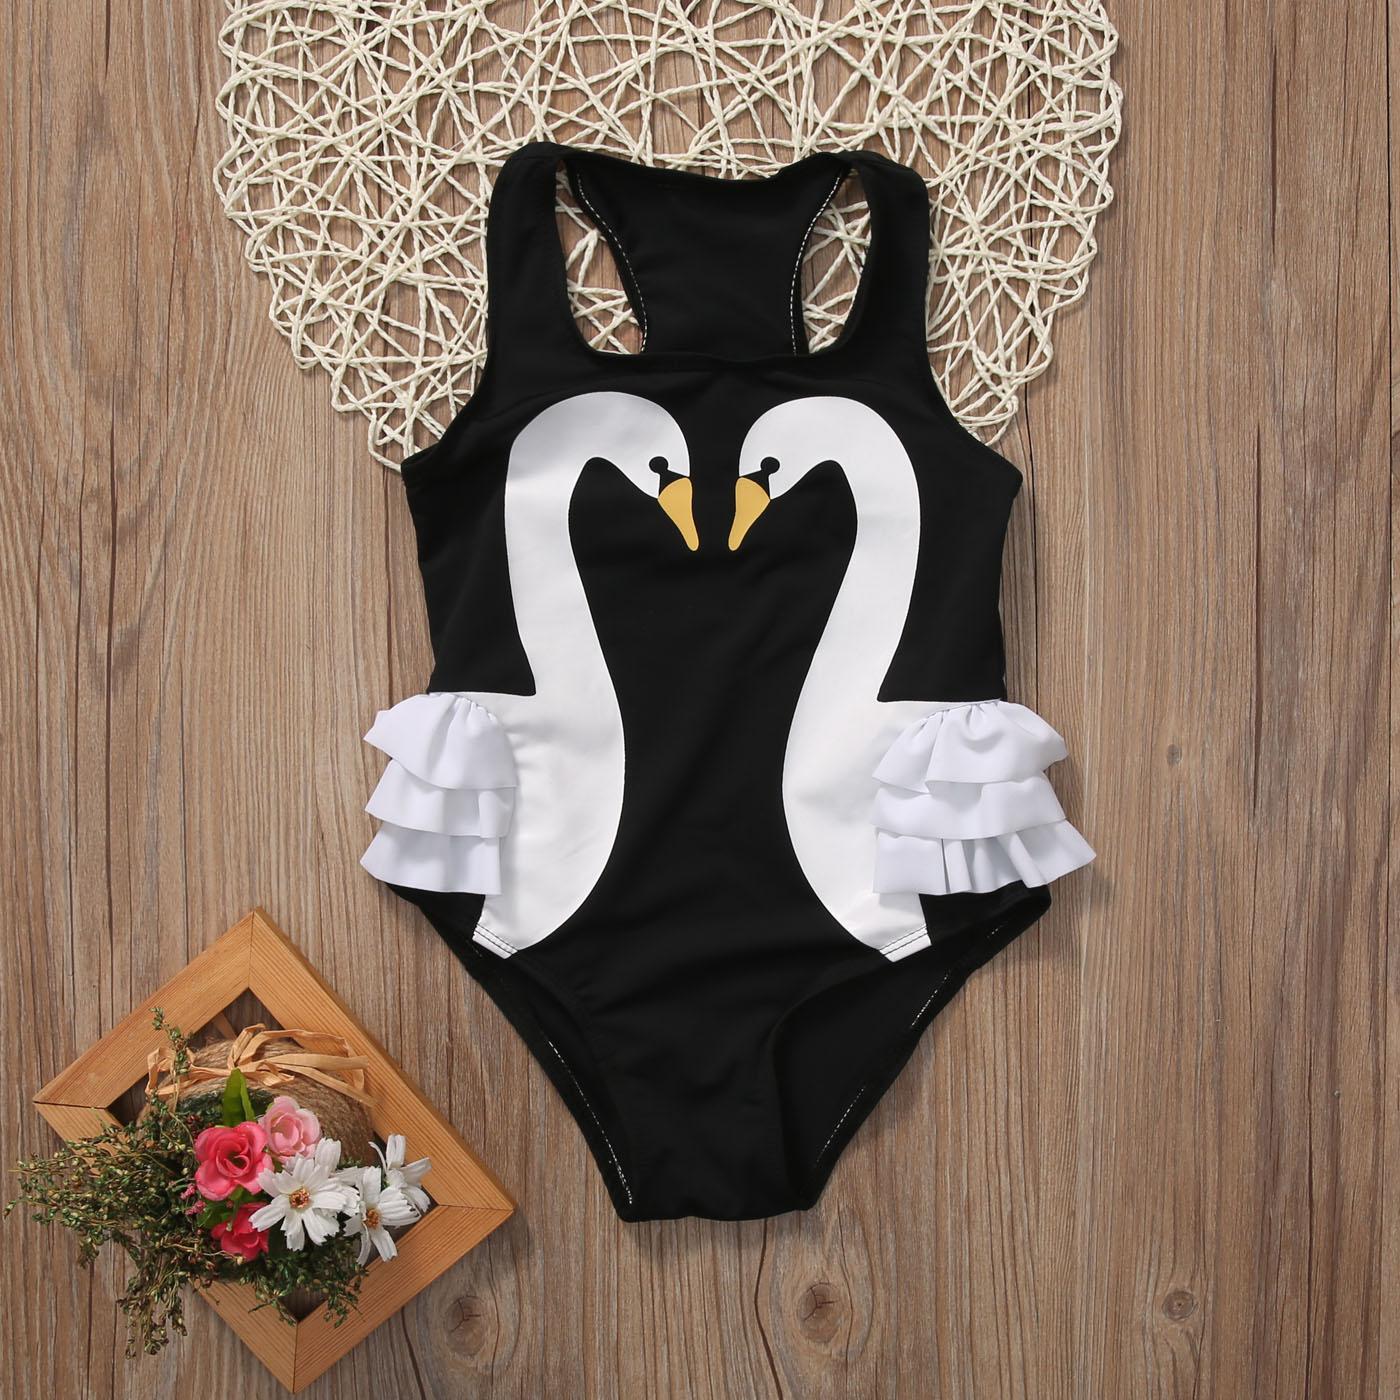 Pudcoco Toddler Kids Baby Girl Swan Ruffle Bikini Suit Swimsuit